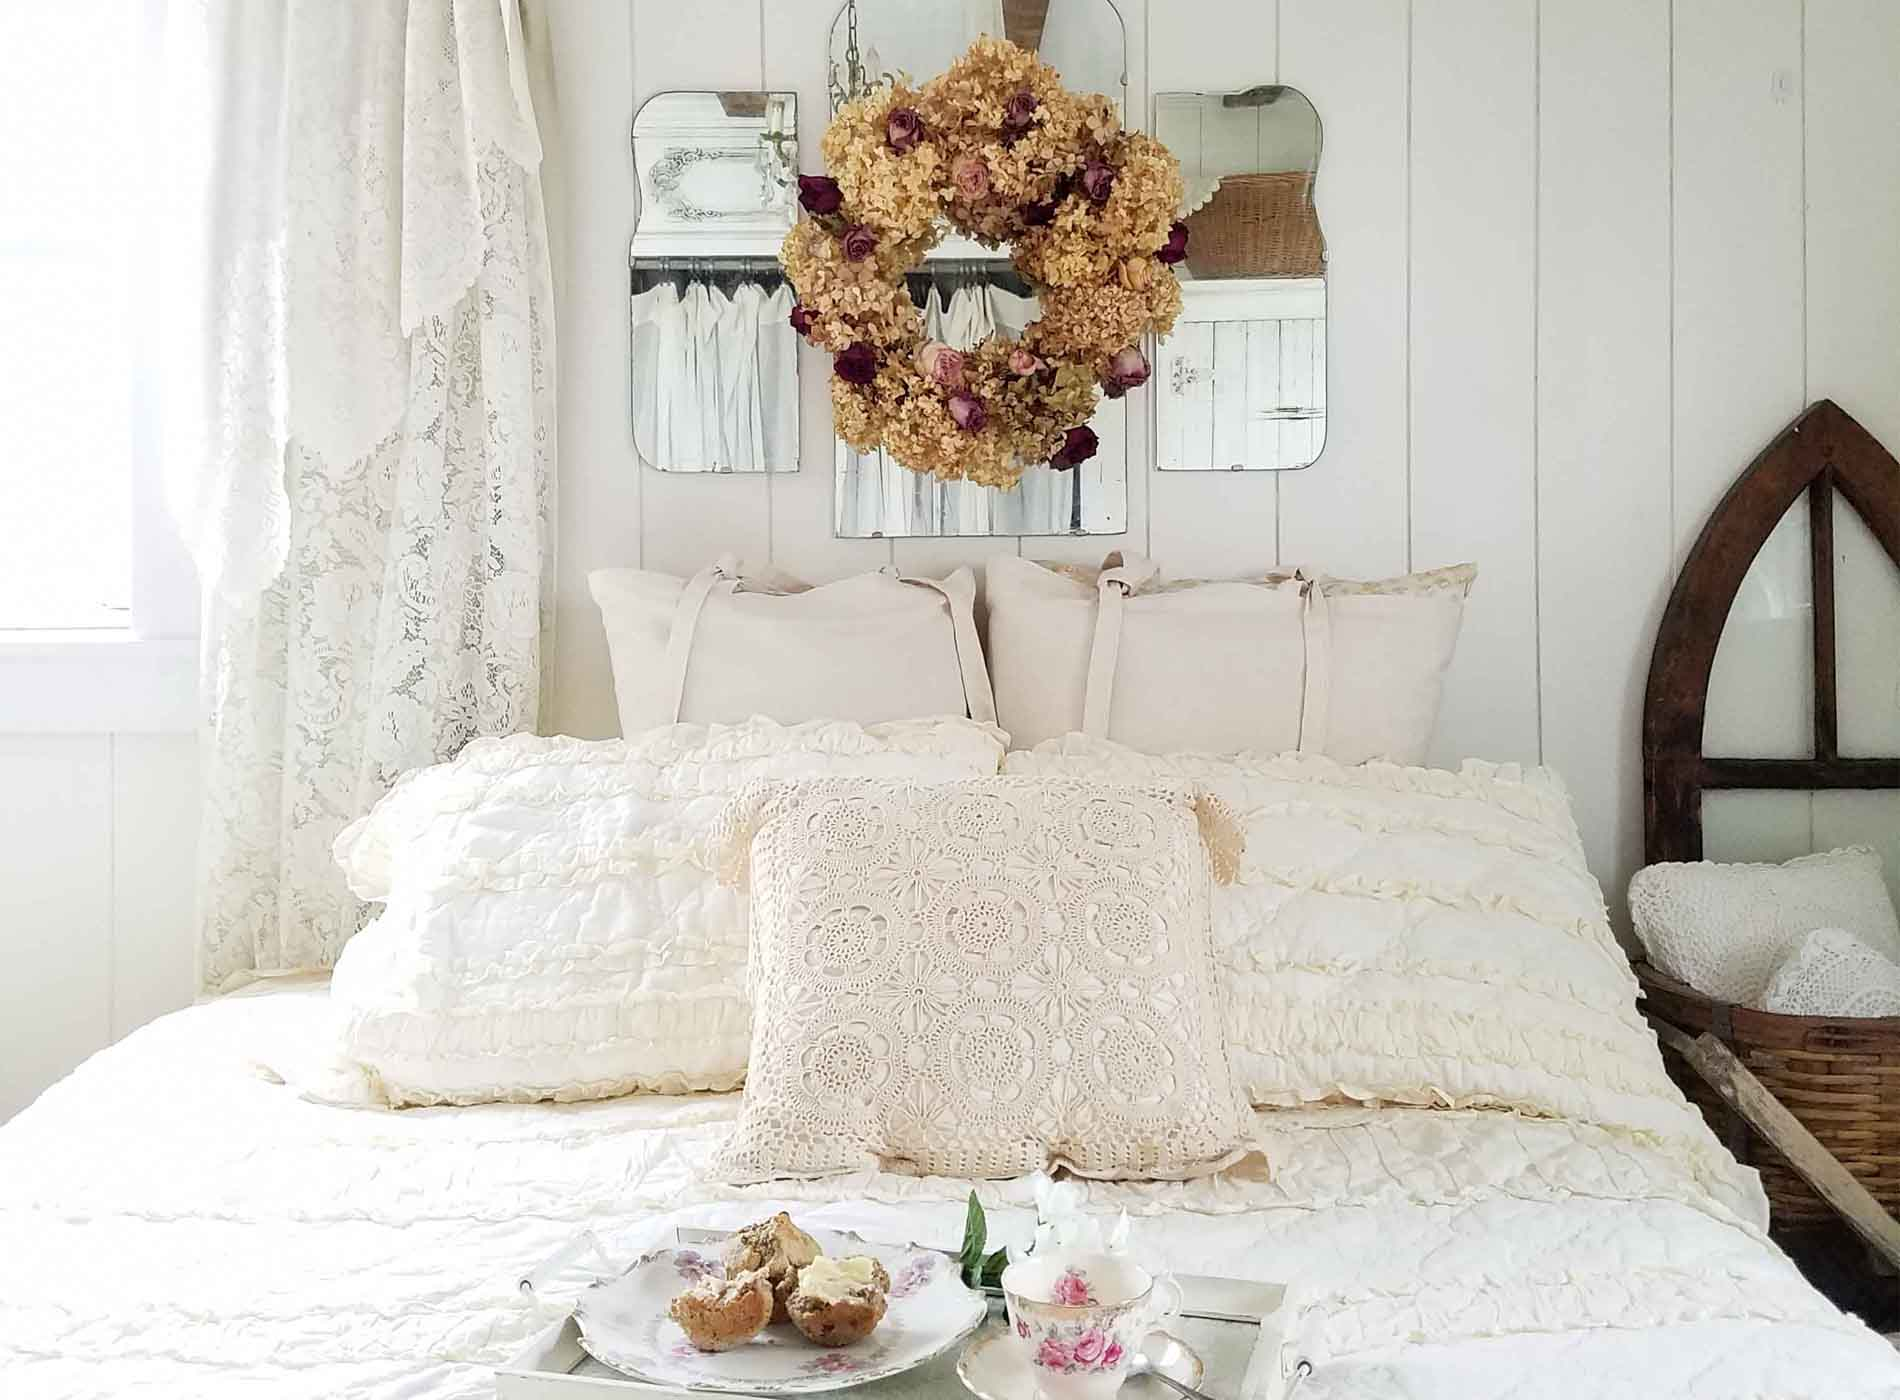 Featured Farmhouse Style Decor on a Budget   Prodigal Pieces   prodigalpieces.com